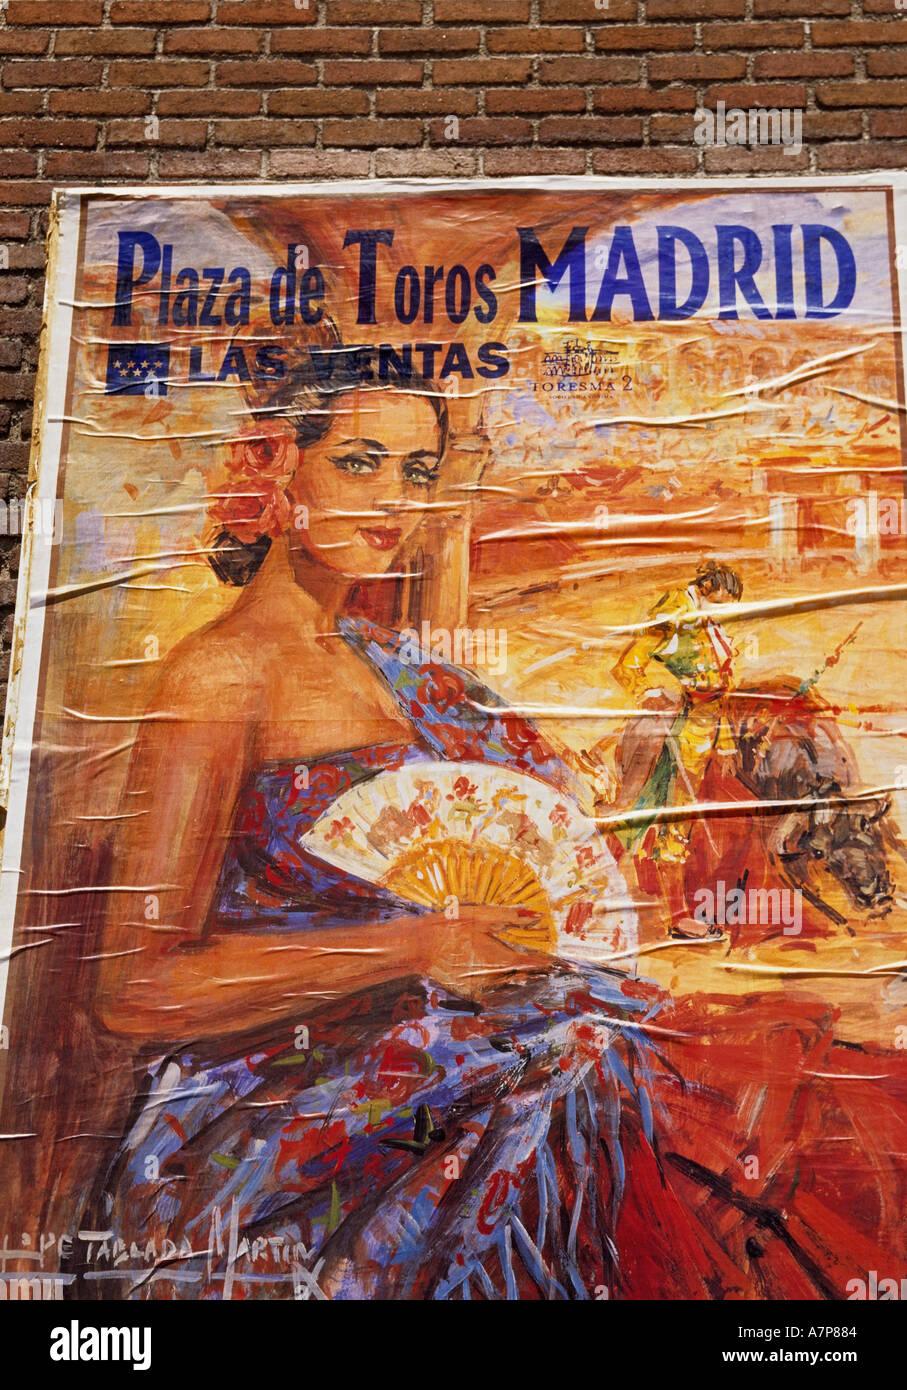 Spain Madrid Plaza Monumental de Las Ventas Plaza de Toros bullfight stadium poster on brick wall - Stock Image